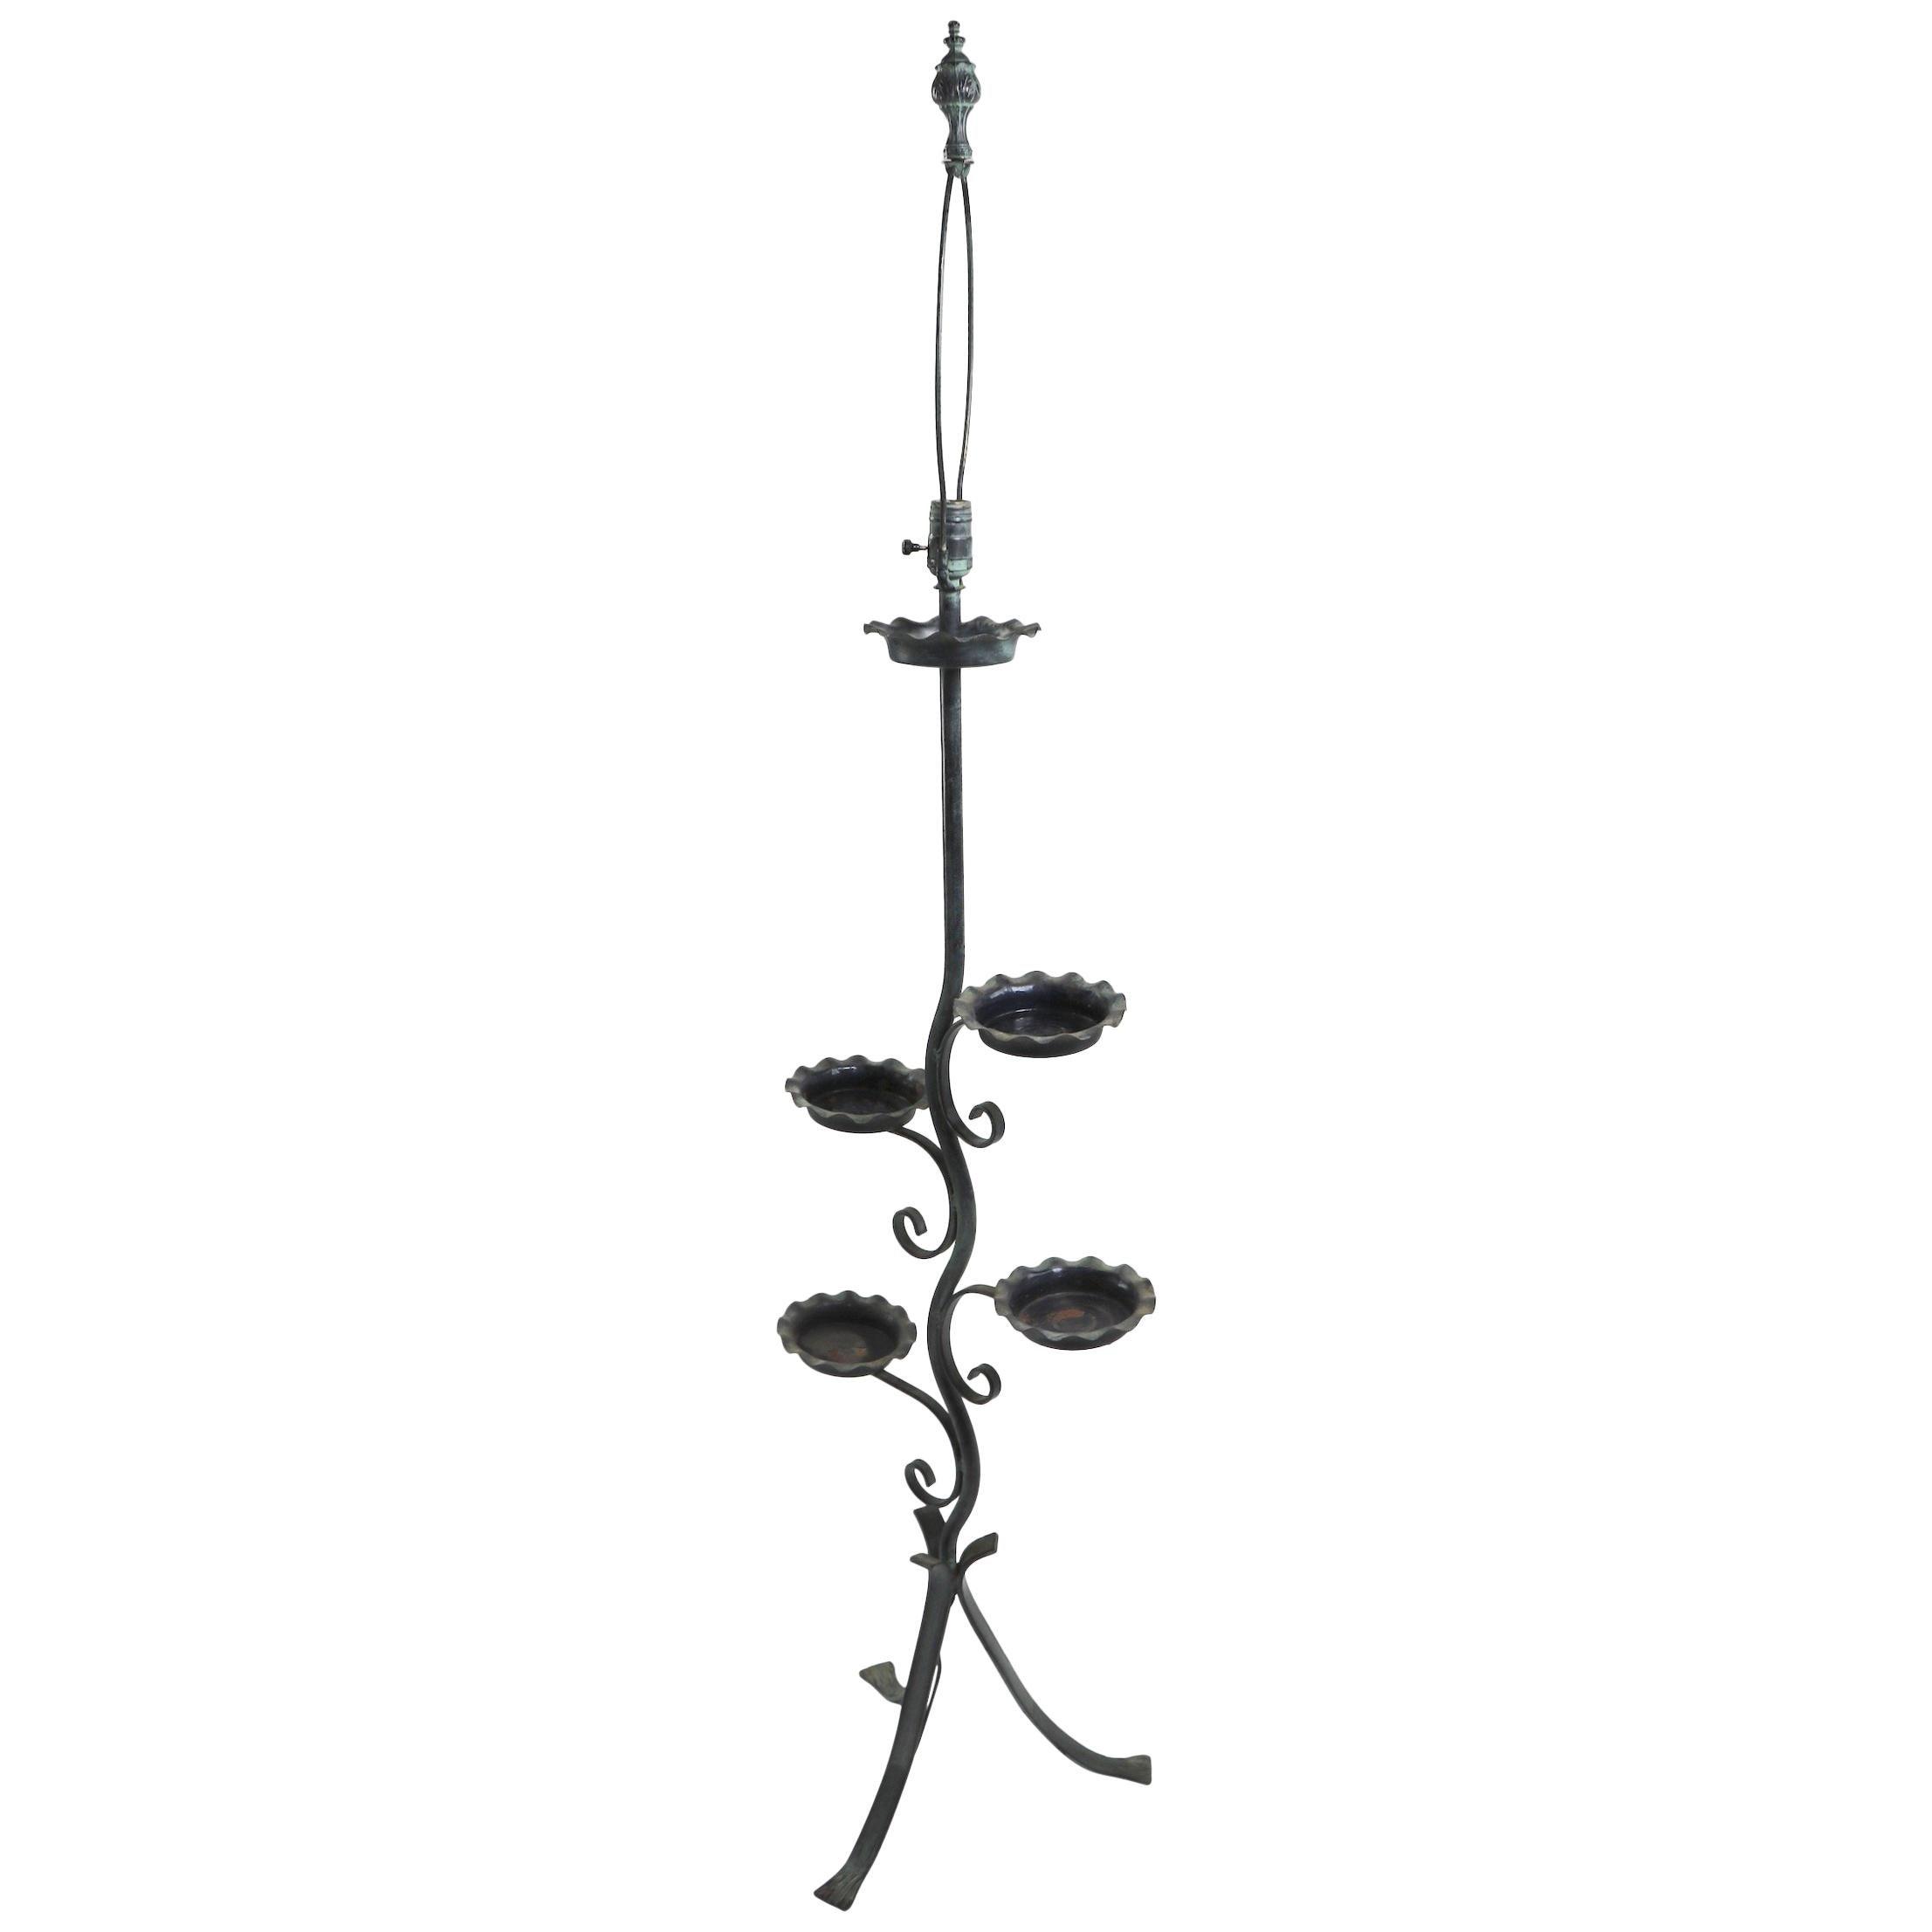 Naturalistic Plant Stand Floor Lamp attributed to Salterini